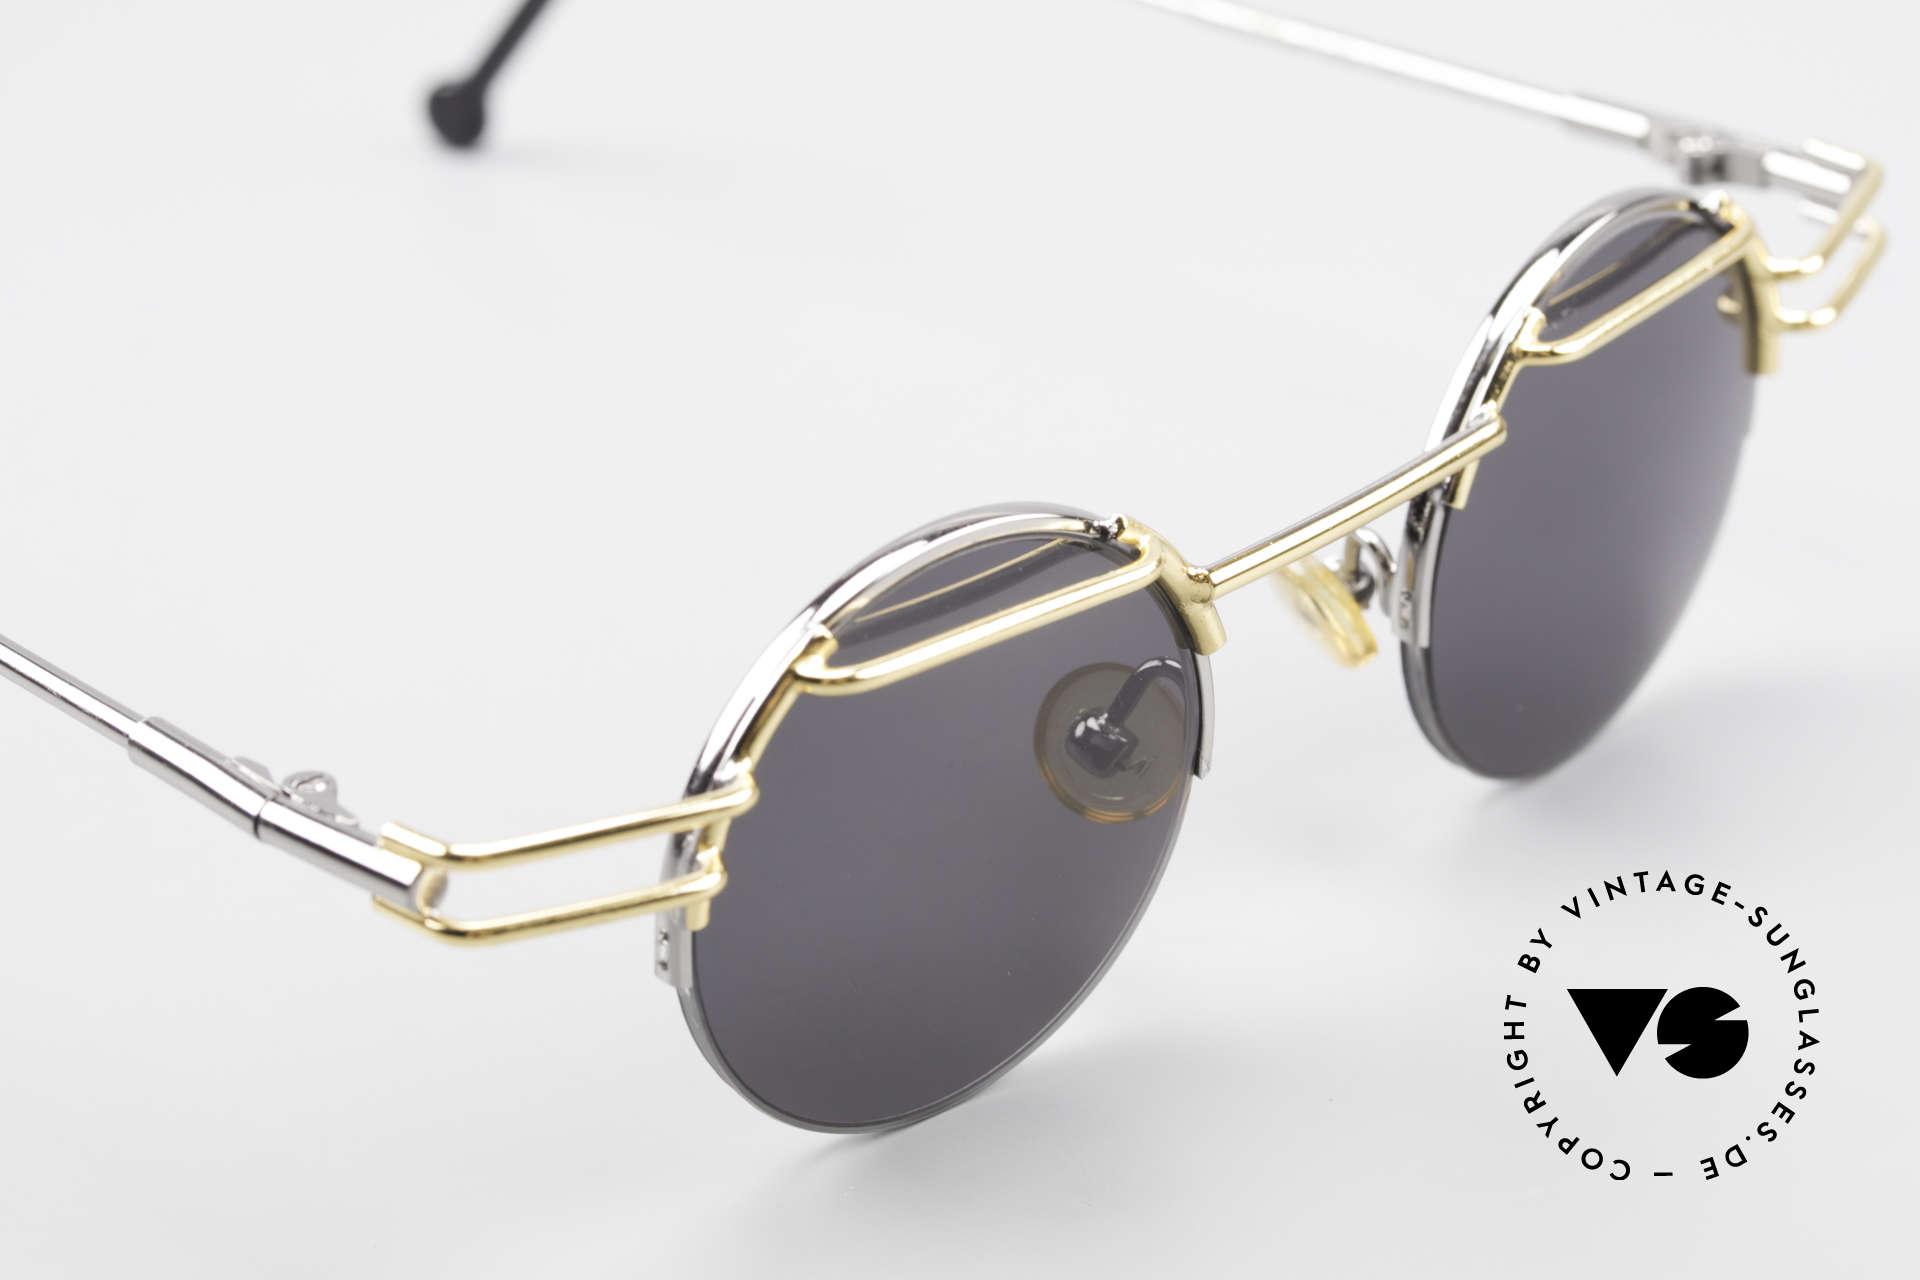 IMAGO Luna 90s Designer Sunglasses Round, NO RETRO (reproduction) shades, but a real old original!, Made for Men and Women